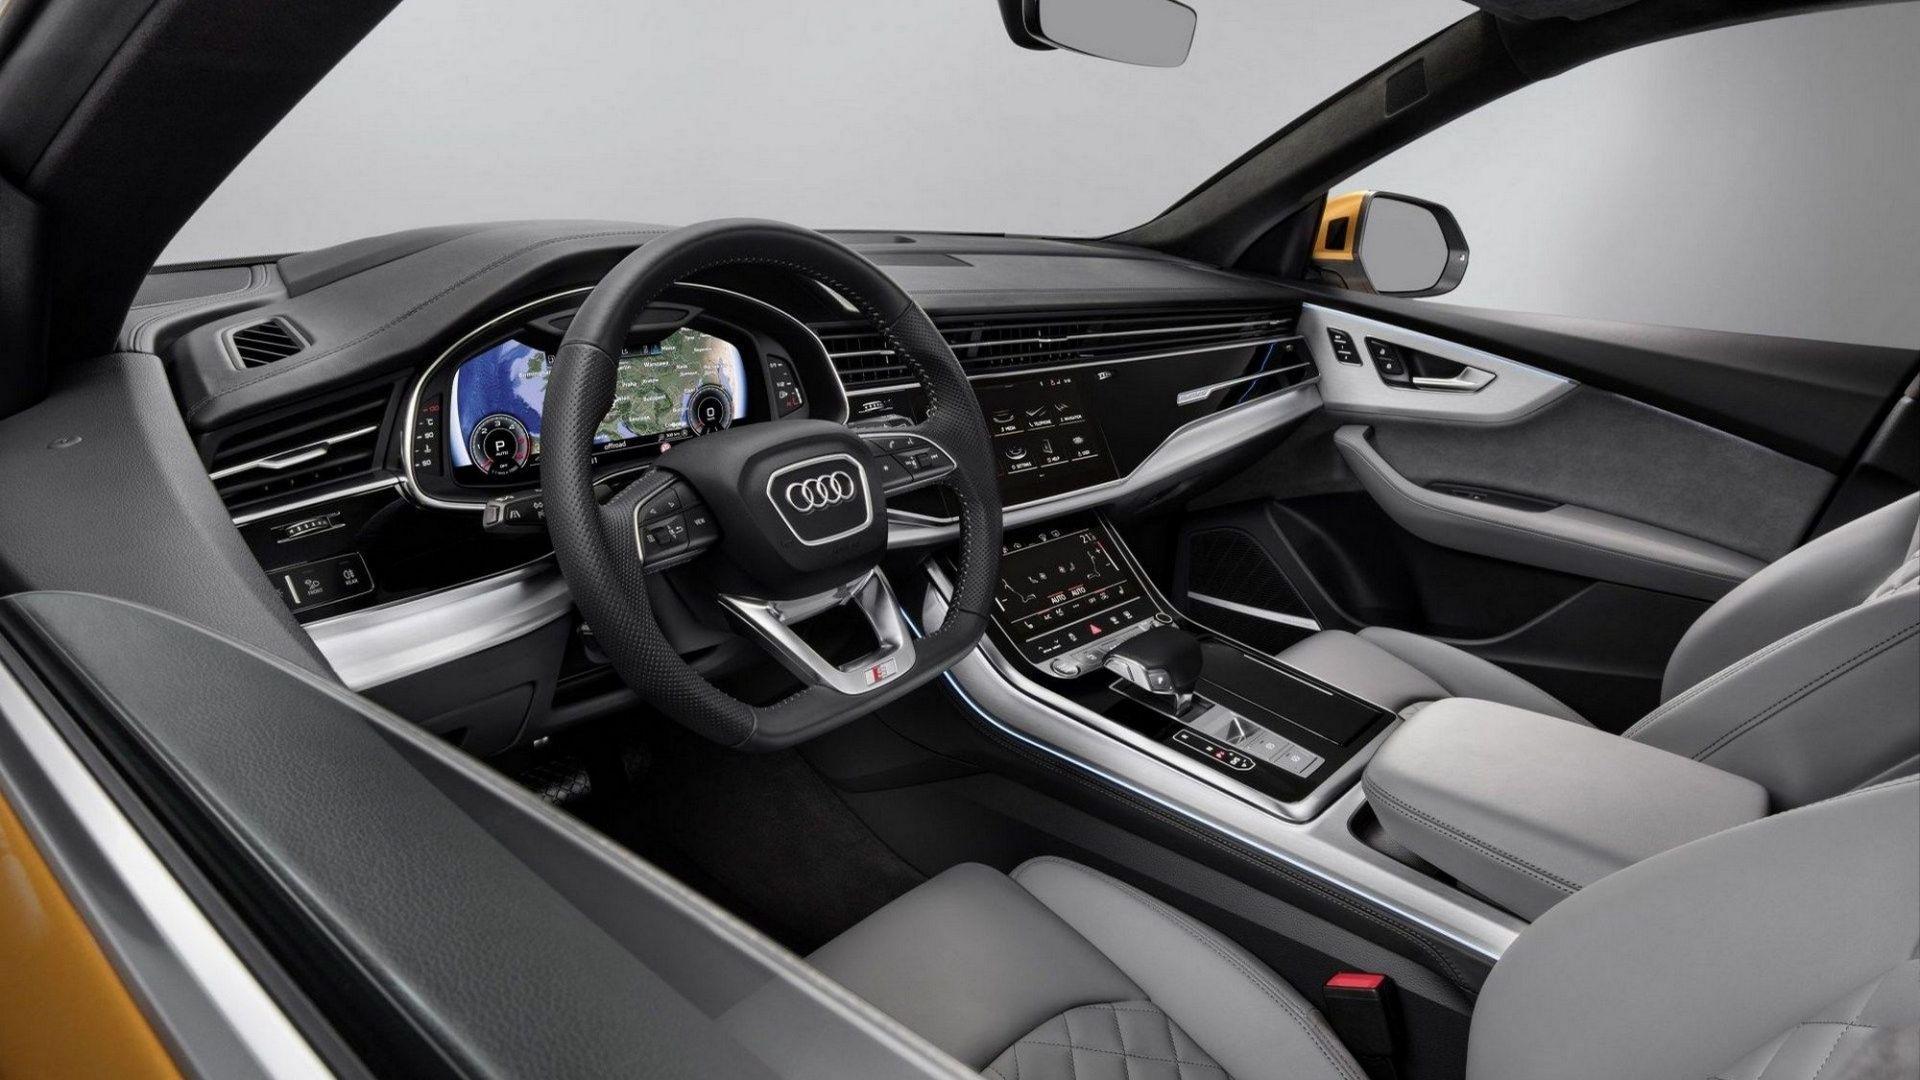 Nuova Audi Q8 Dimensioni Interni Motori Prezzi Tempi